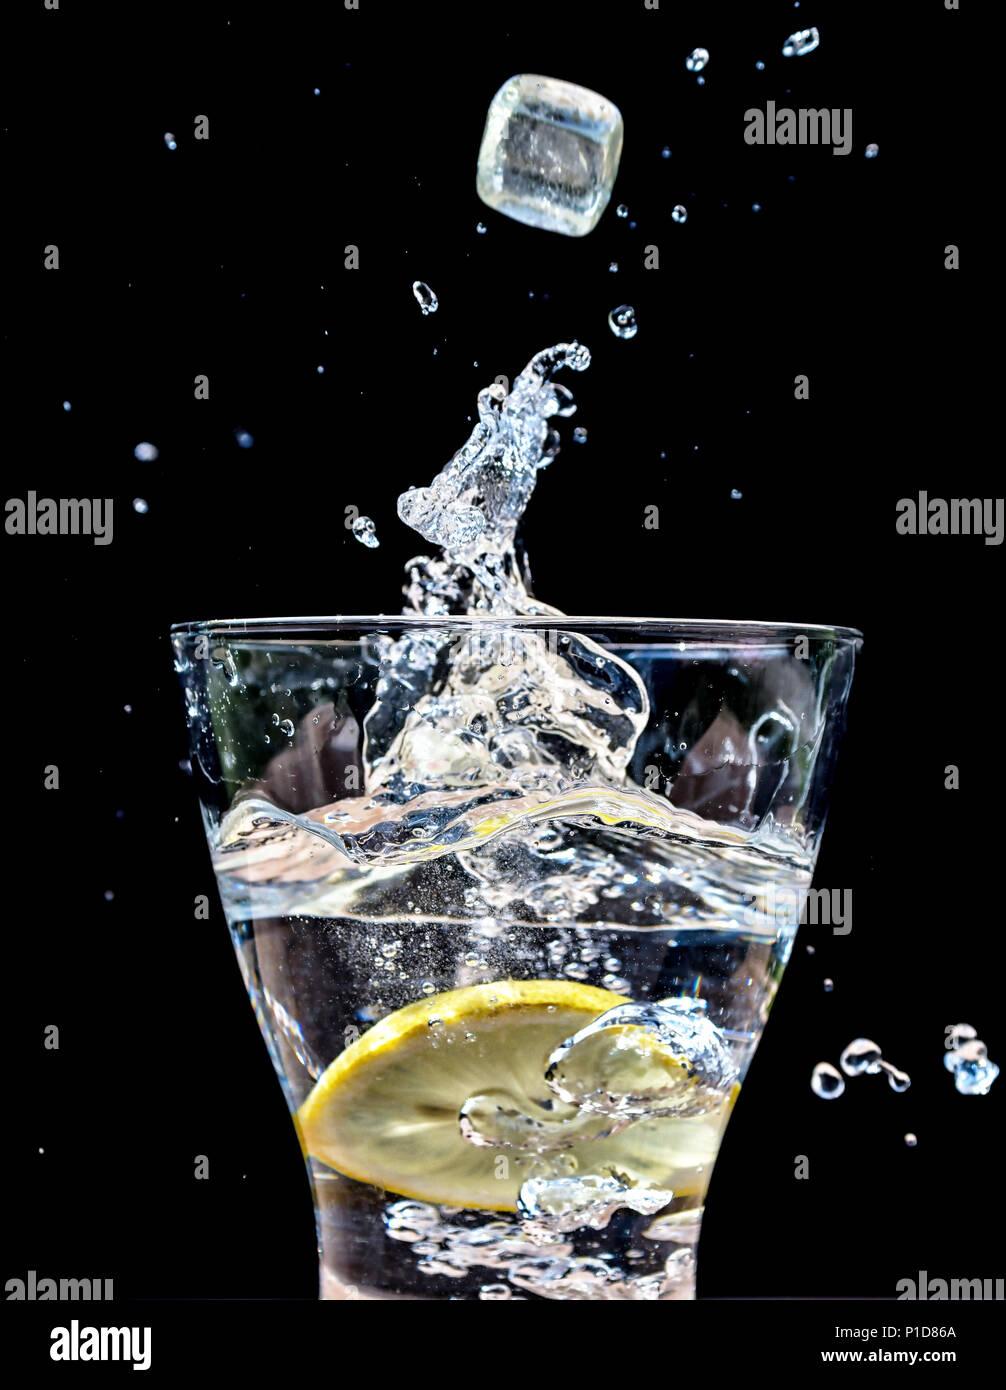 Cubitos de hielo cayendo en un vaso de agua creando un chorrito Imagen De Stock